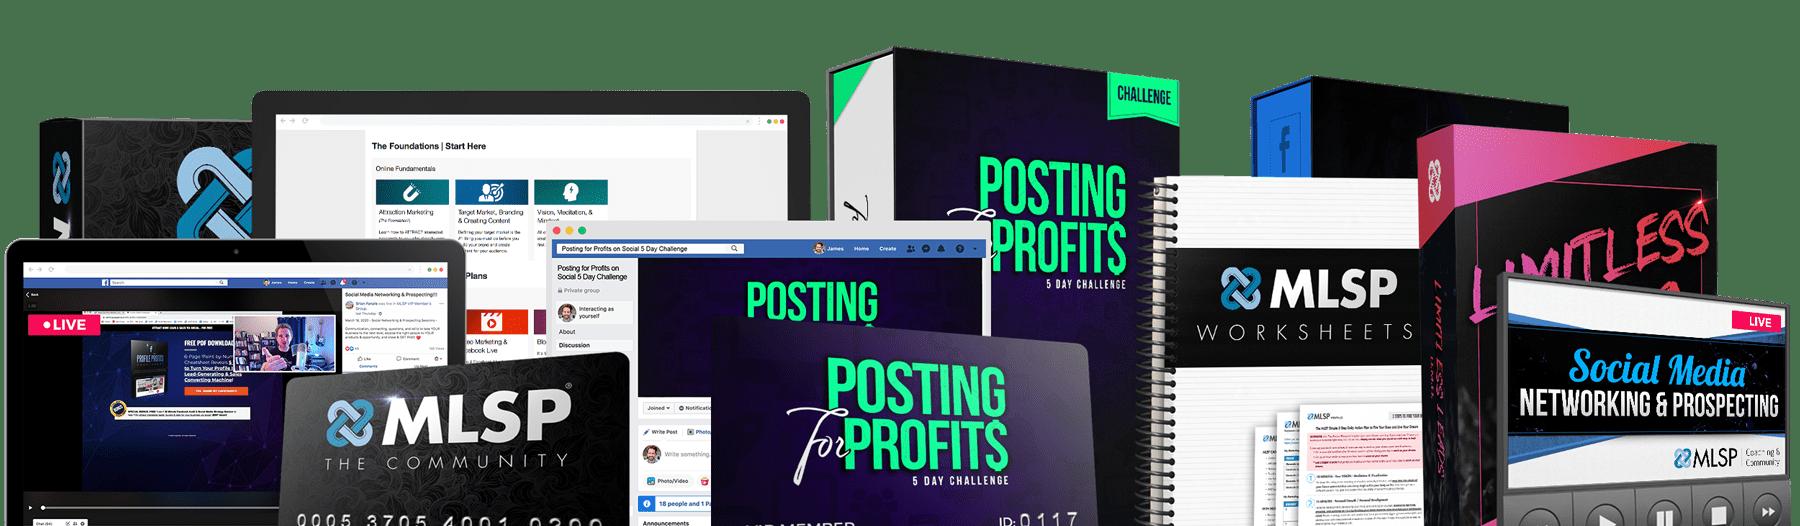 5-Day 'Posting for Profits' Challenge